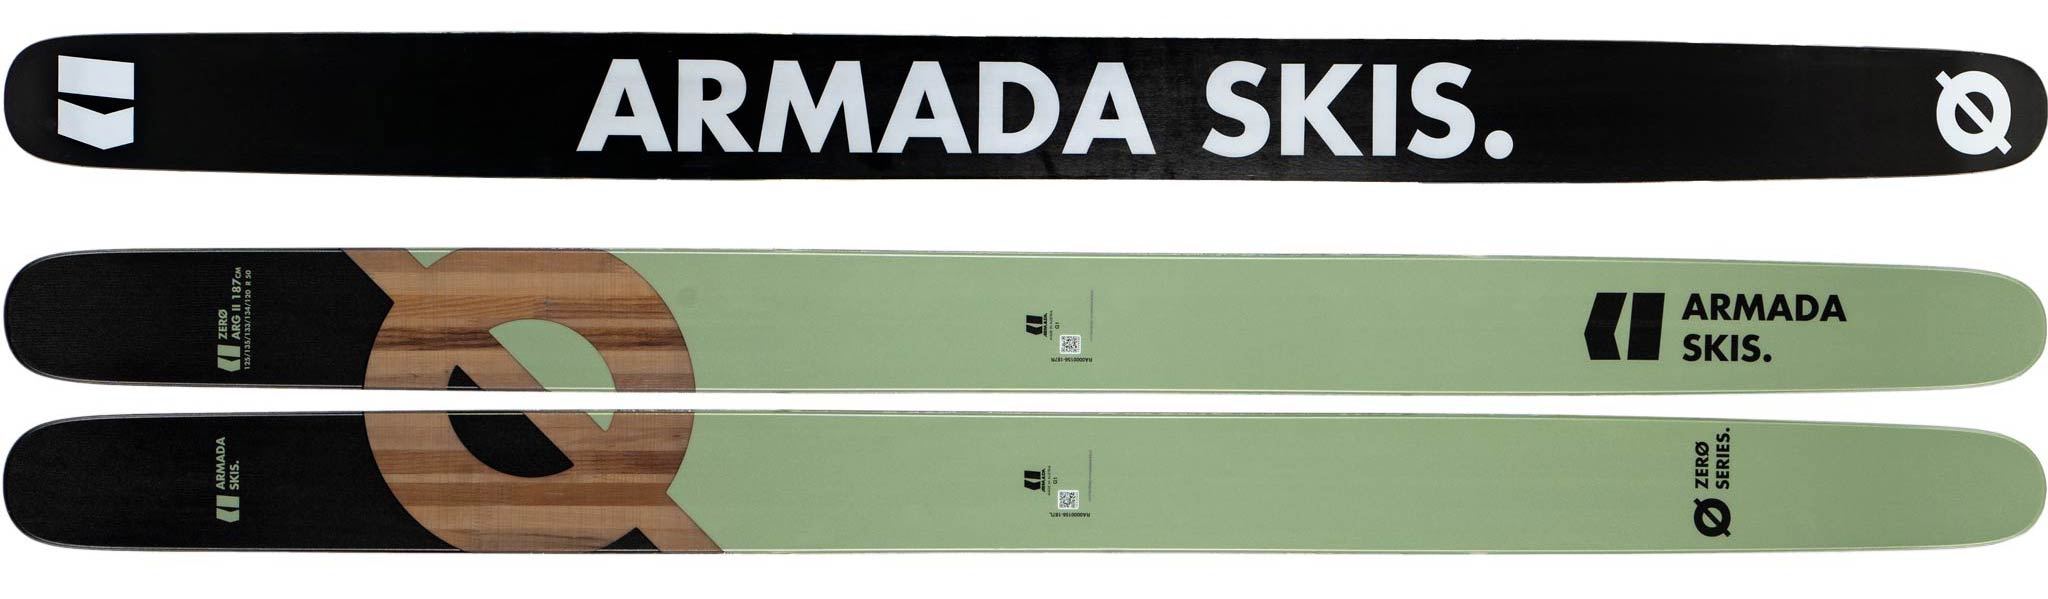 Armada Skis 2019/2020 - ARG II: Topsheet und Base